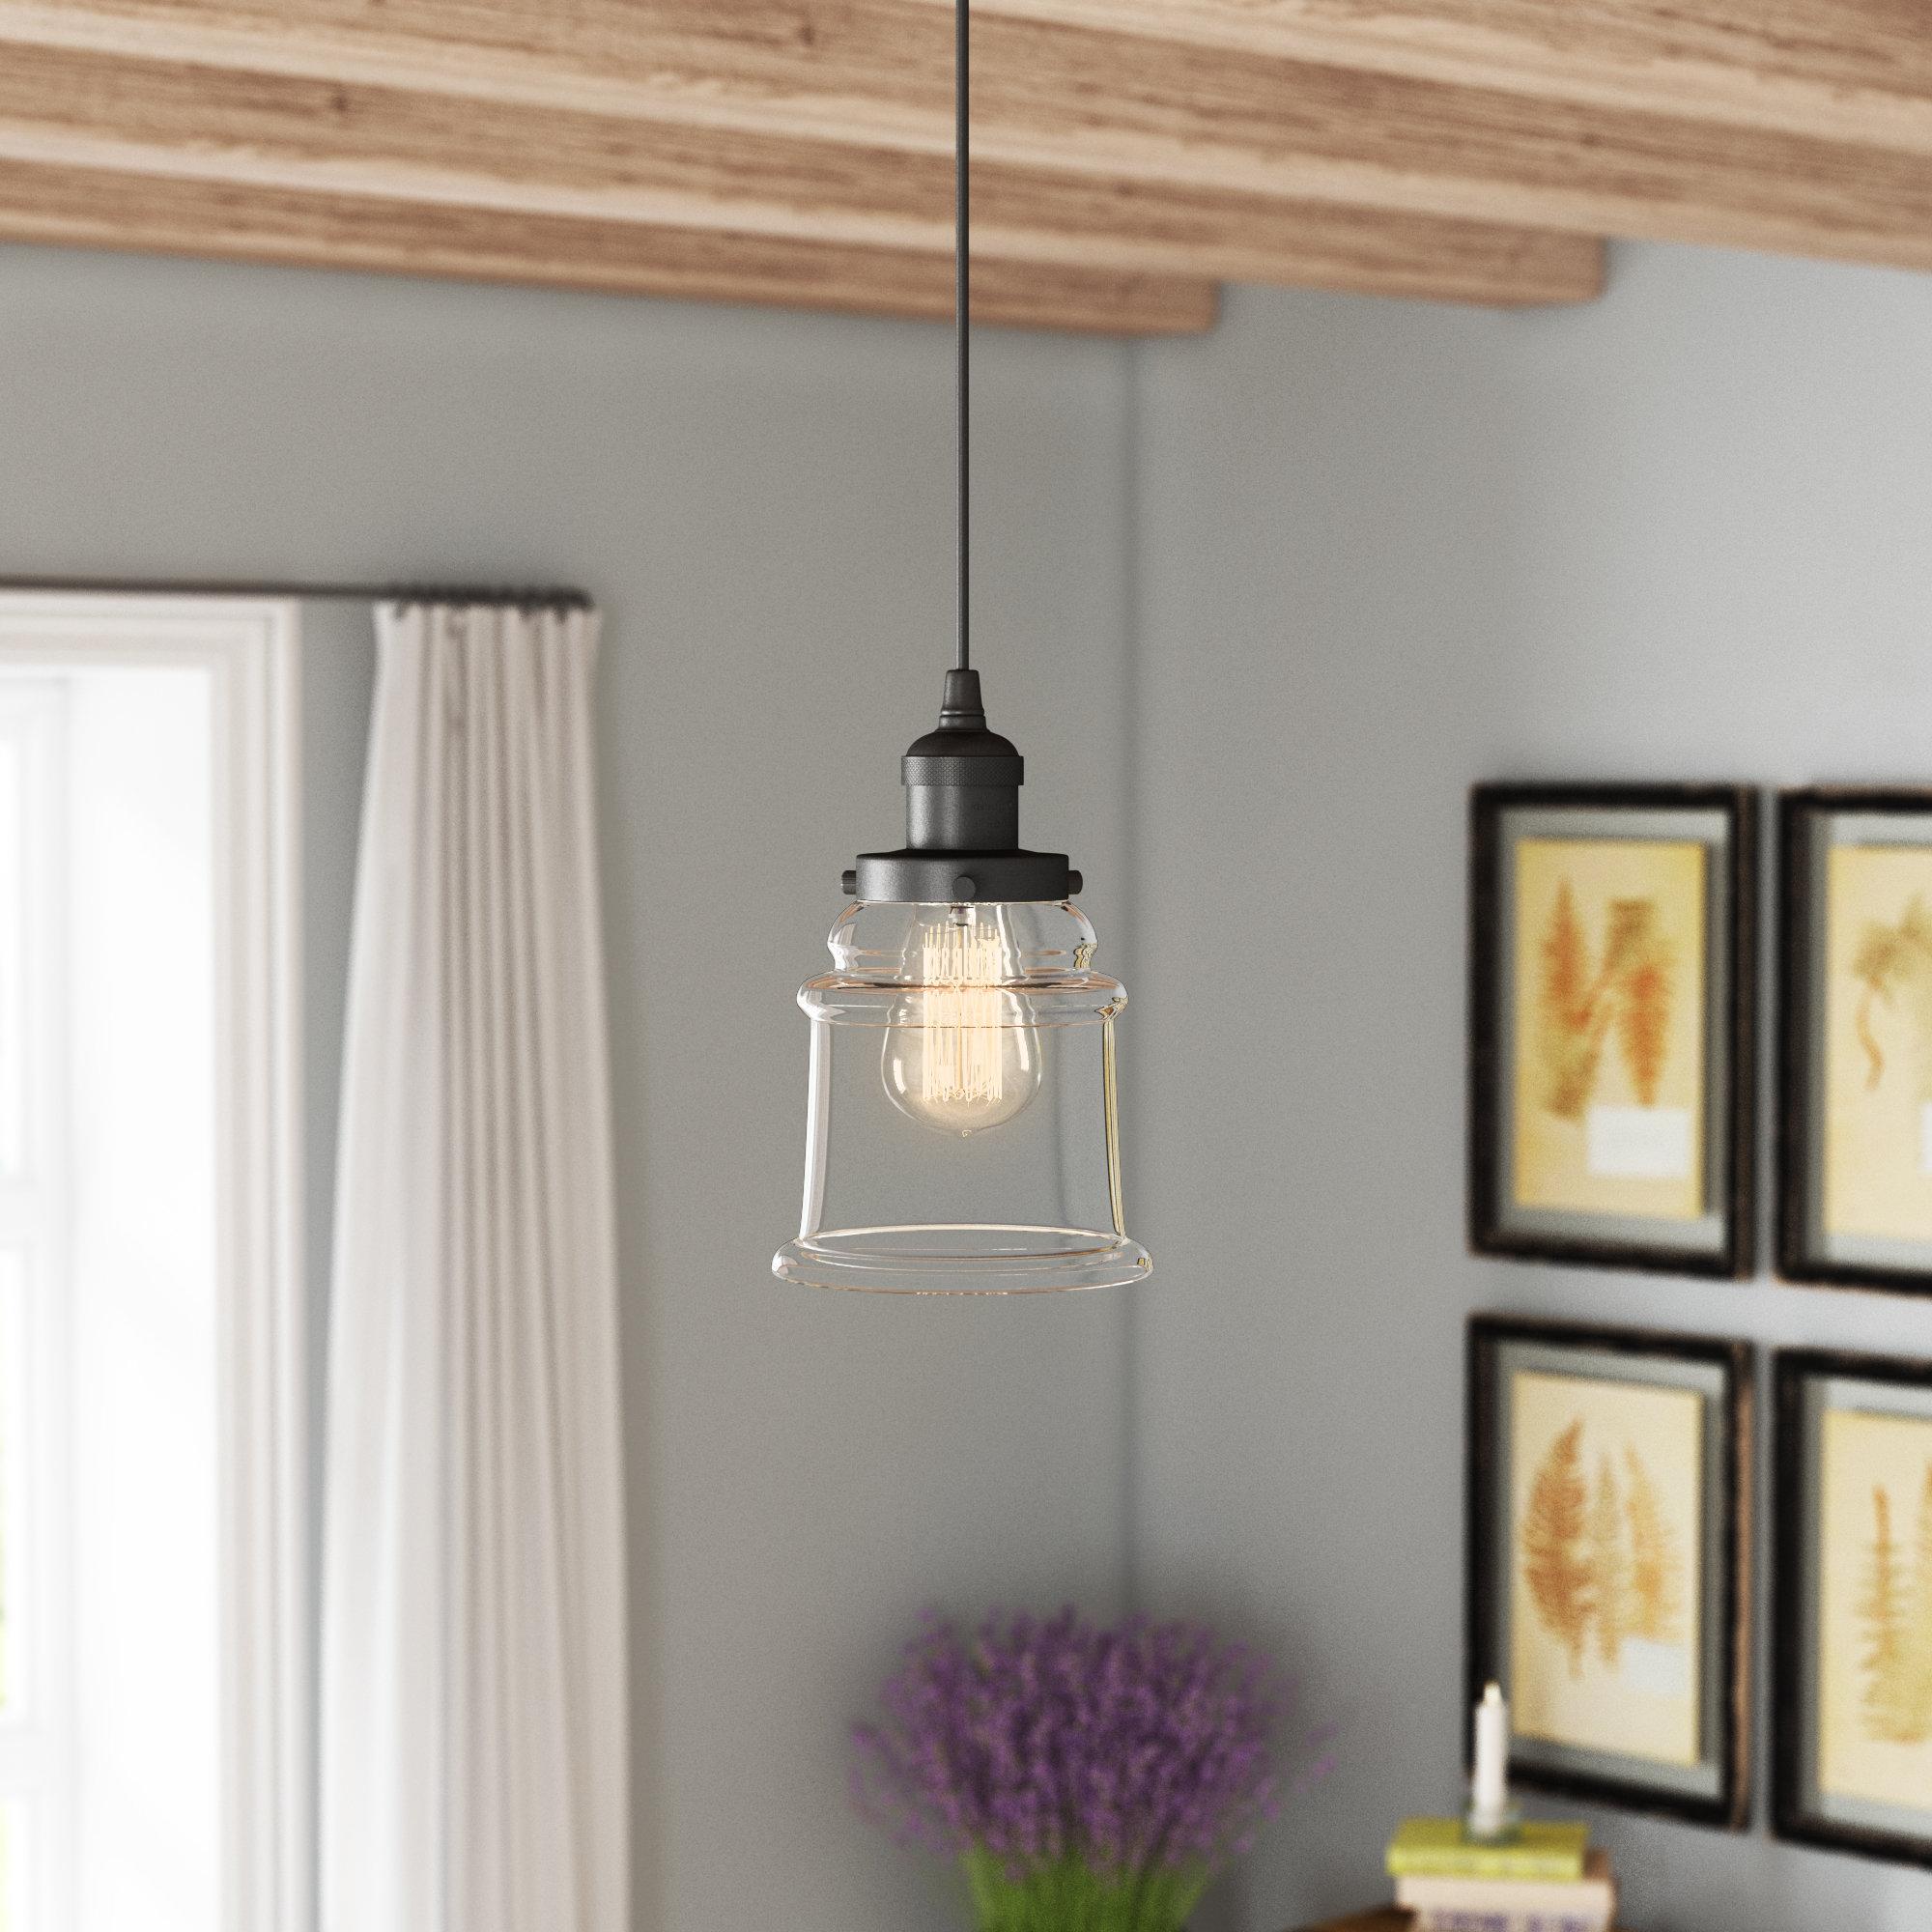 1 Light Single Bell Pendants Pertaining To Best And Newest Greeley 1 Light Single Bell Pendant (View 15 of 25)